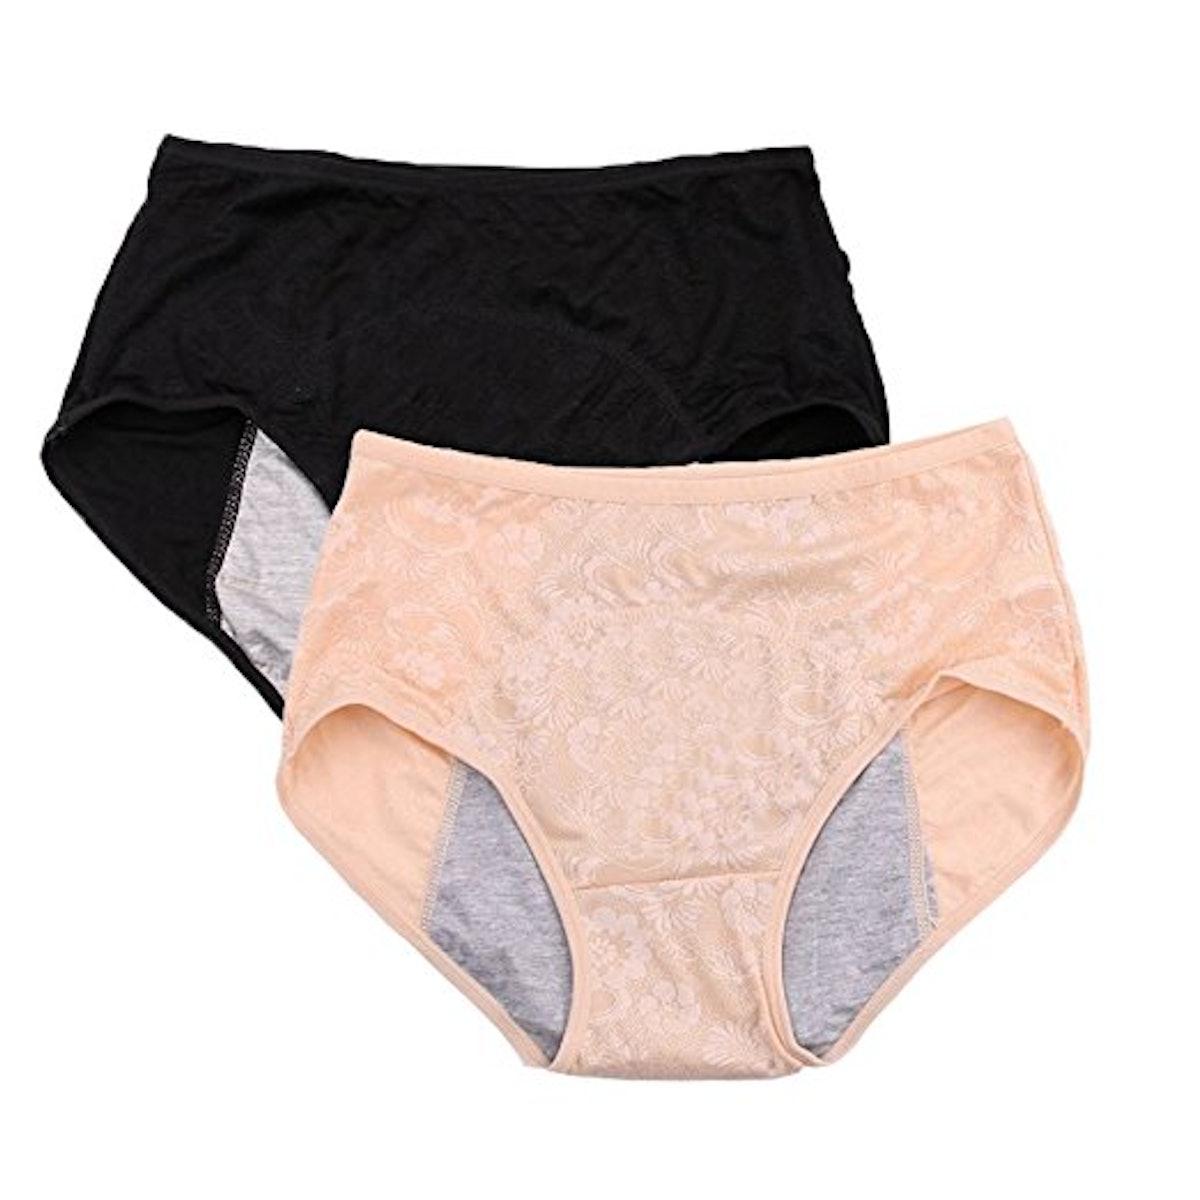 YOYI FASHION Menstrual Briefs (Sizes XS-4XL) (2 Pack),